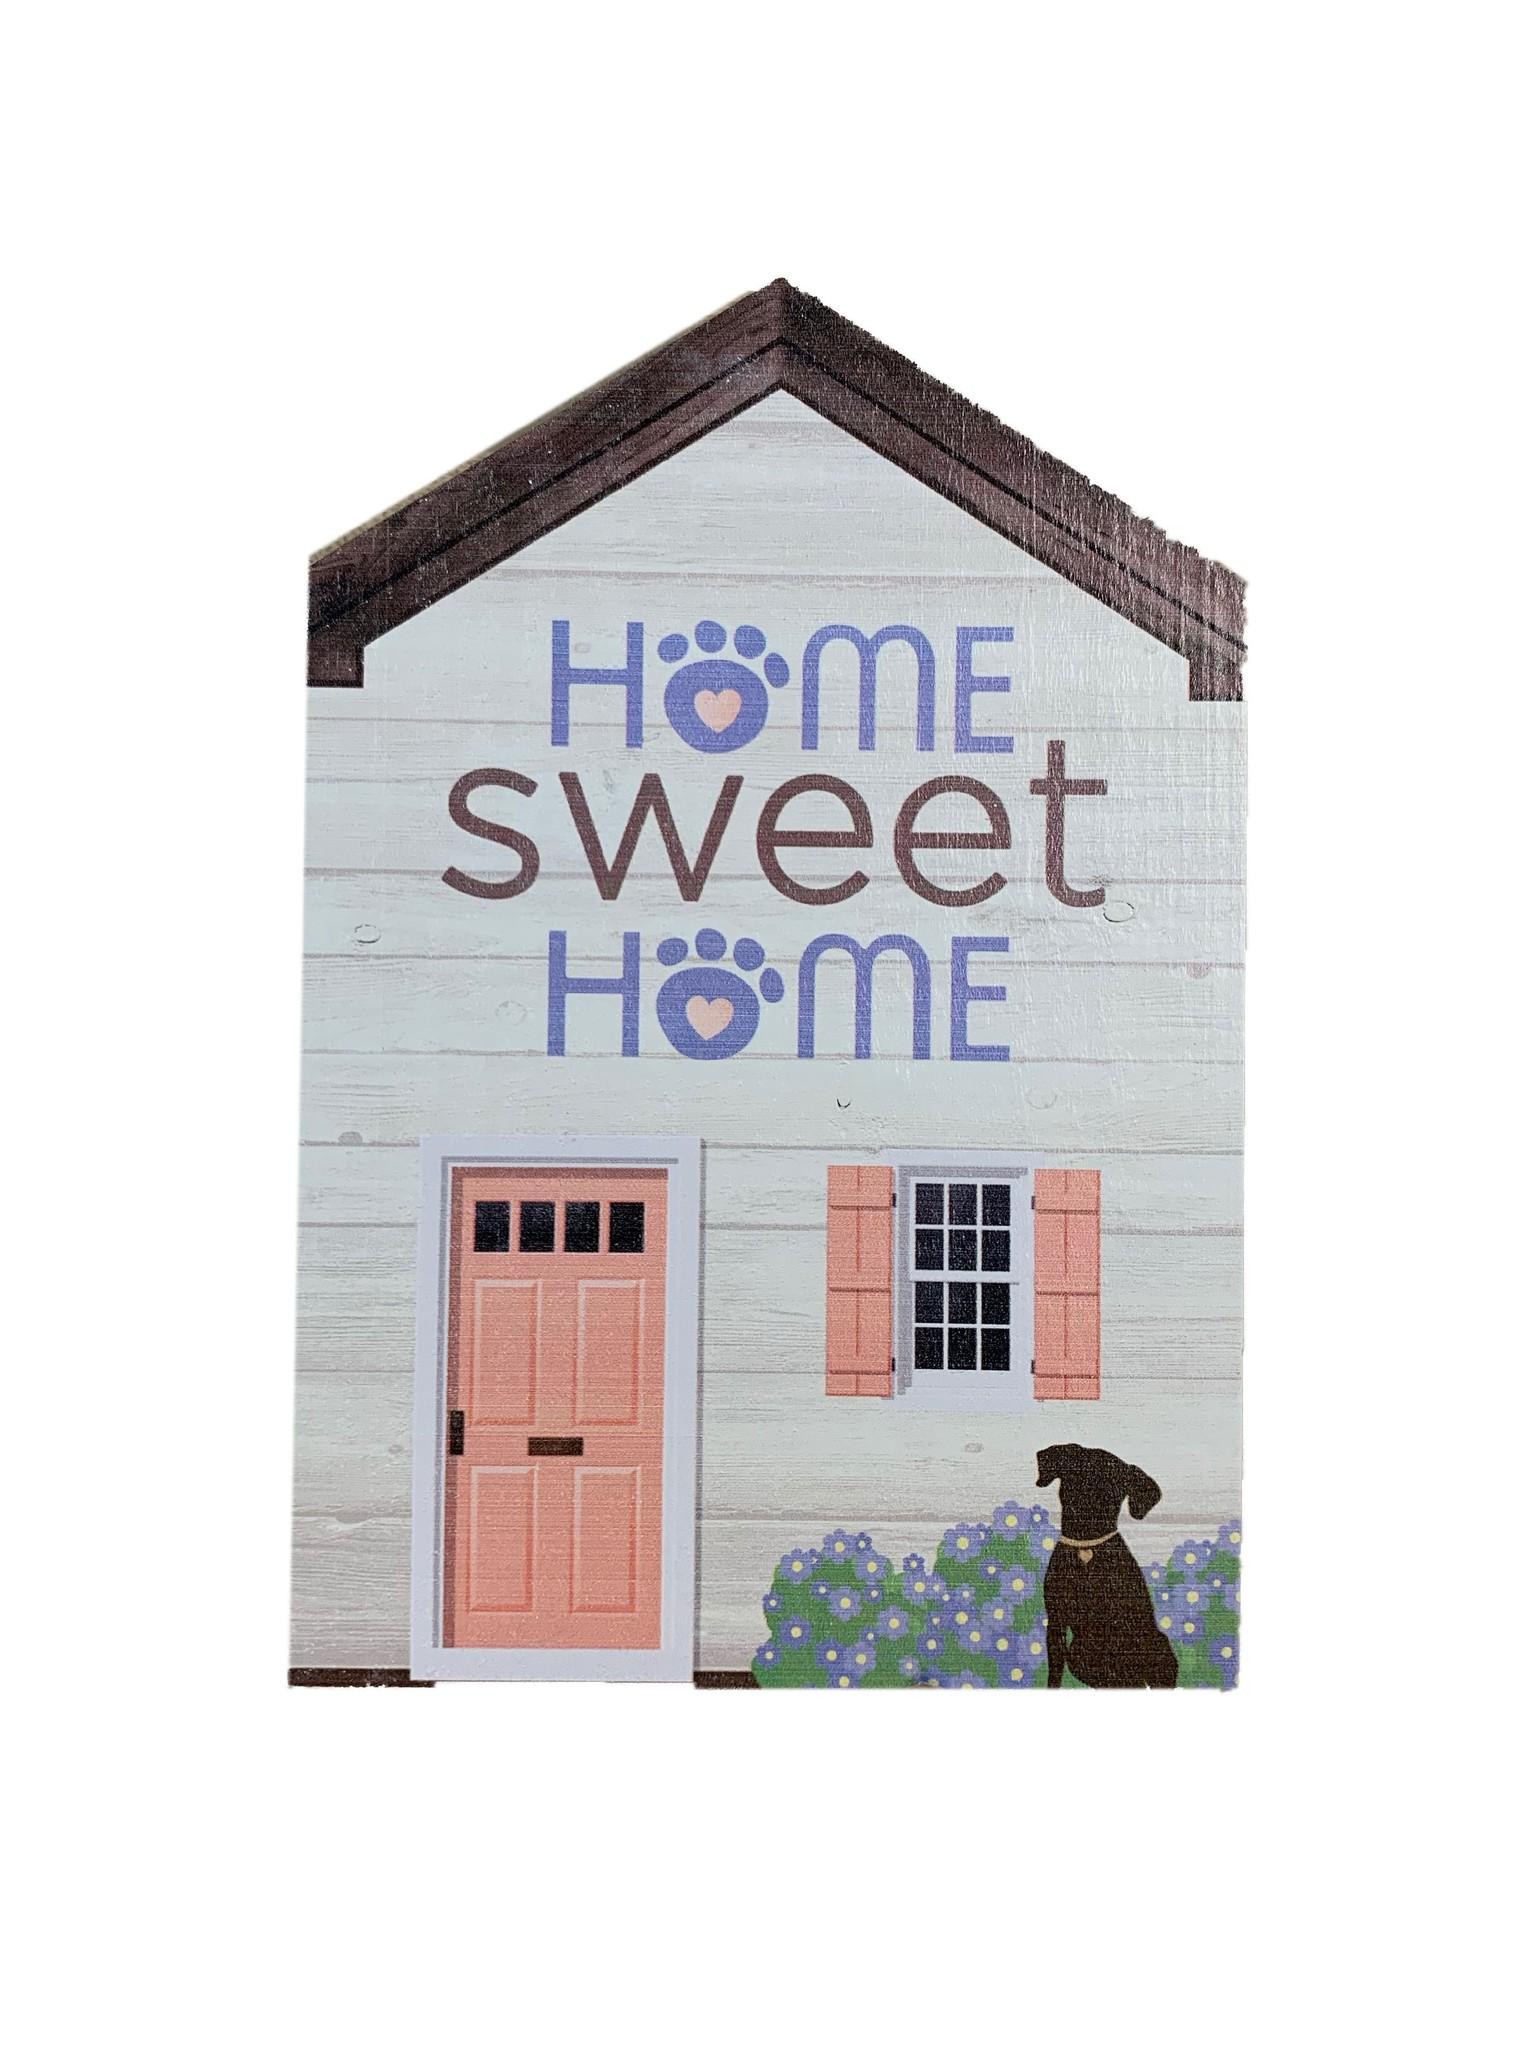 Dog Speak Dog Speak Large Rustic Wood House - Home Sweet Home